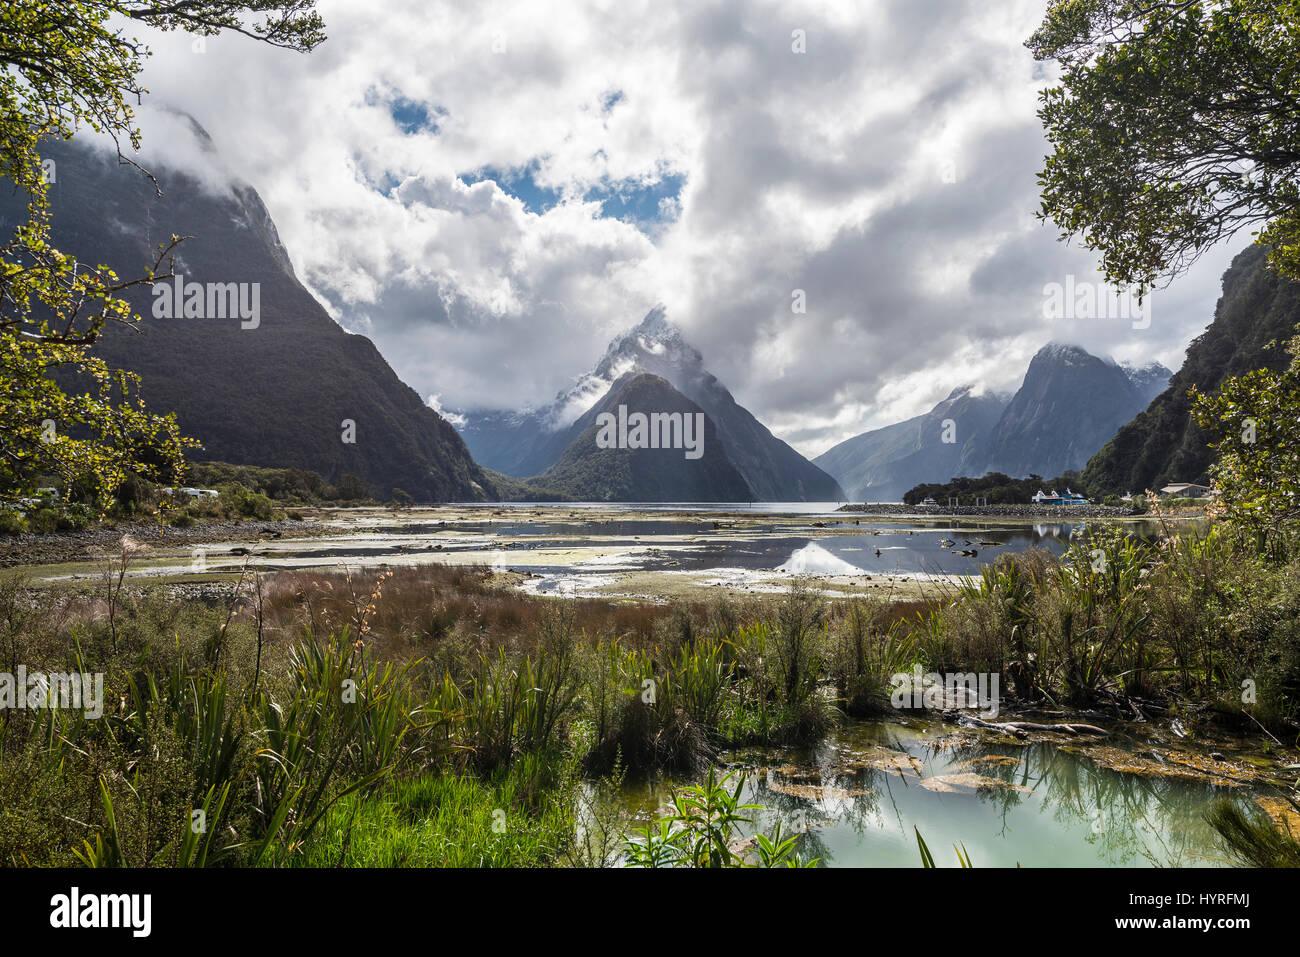 Miter Peak Milford Sound Fiordland National Park Te Anau